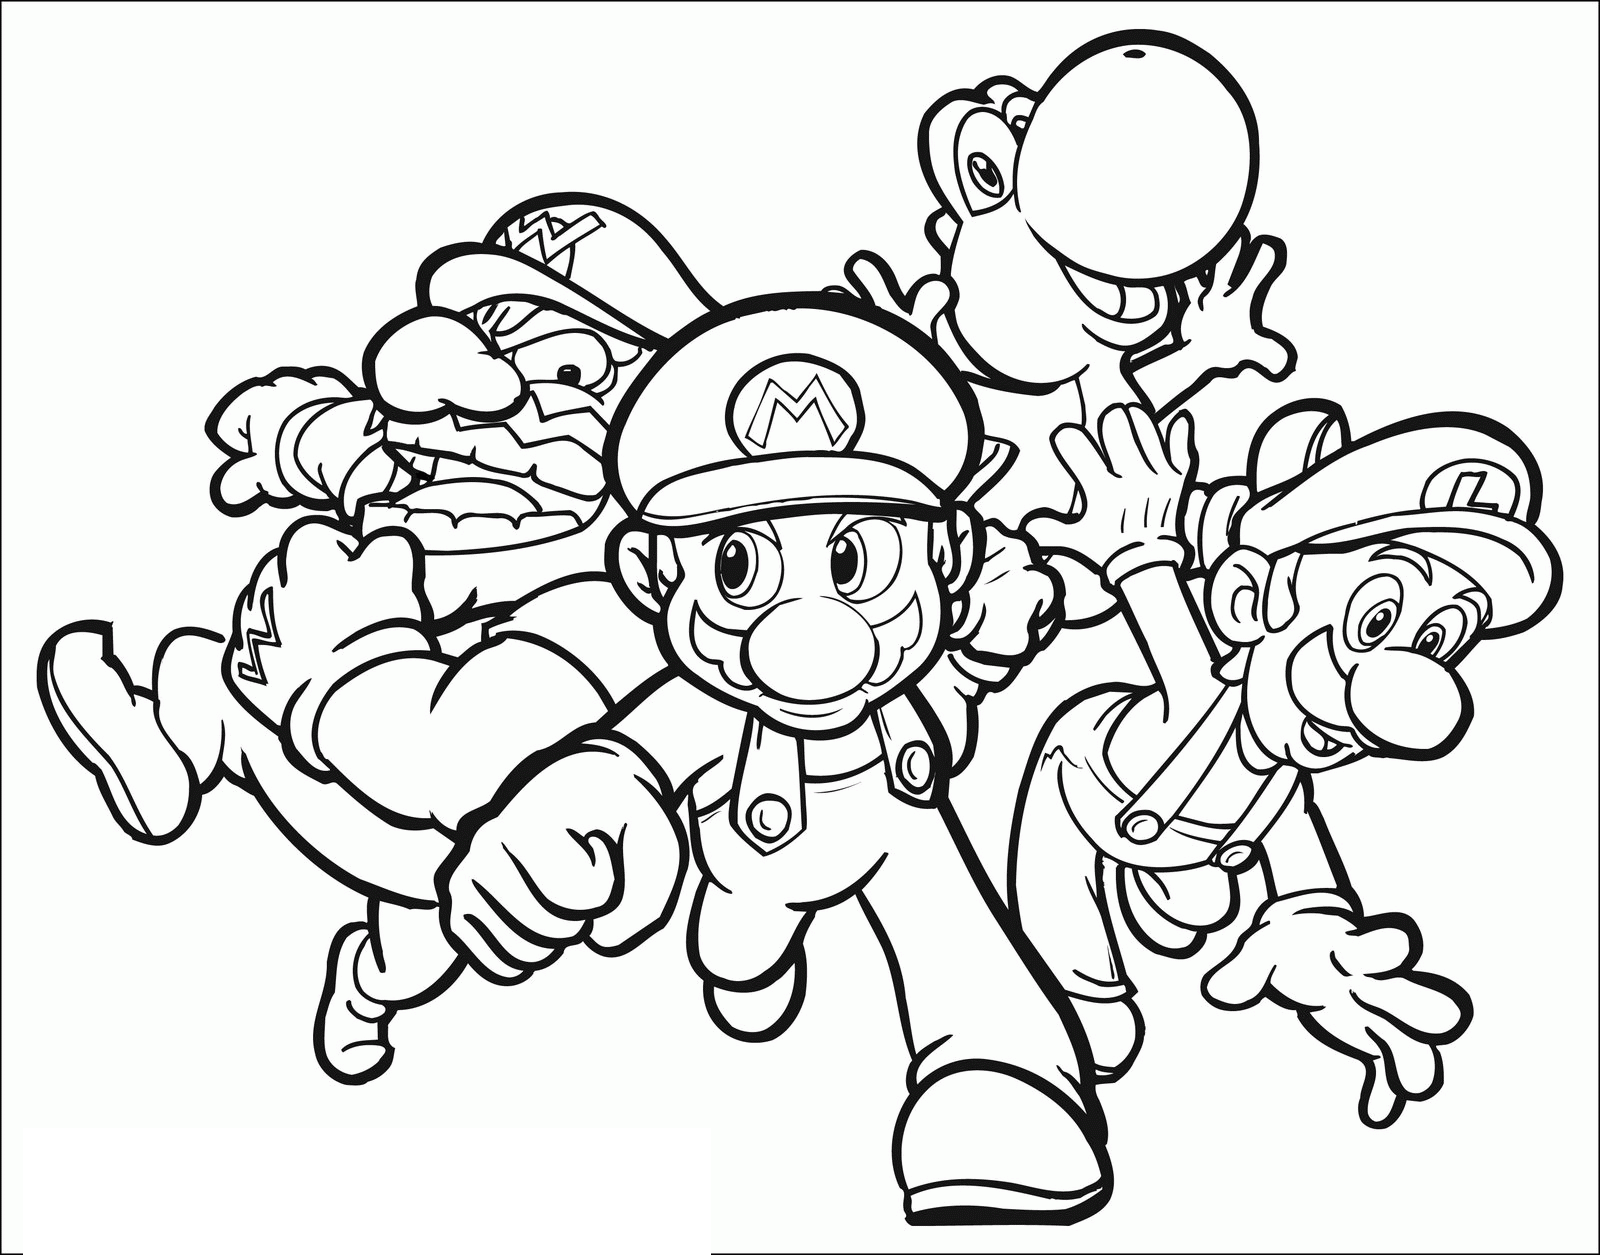 1600x1255 Super Mario Bros